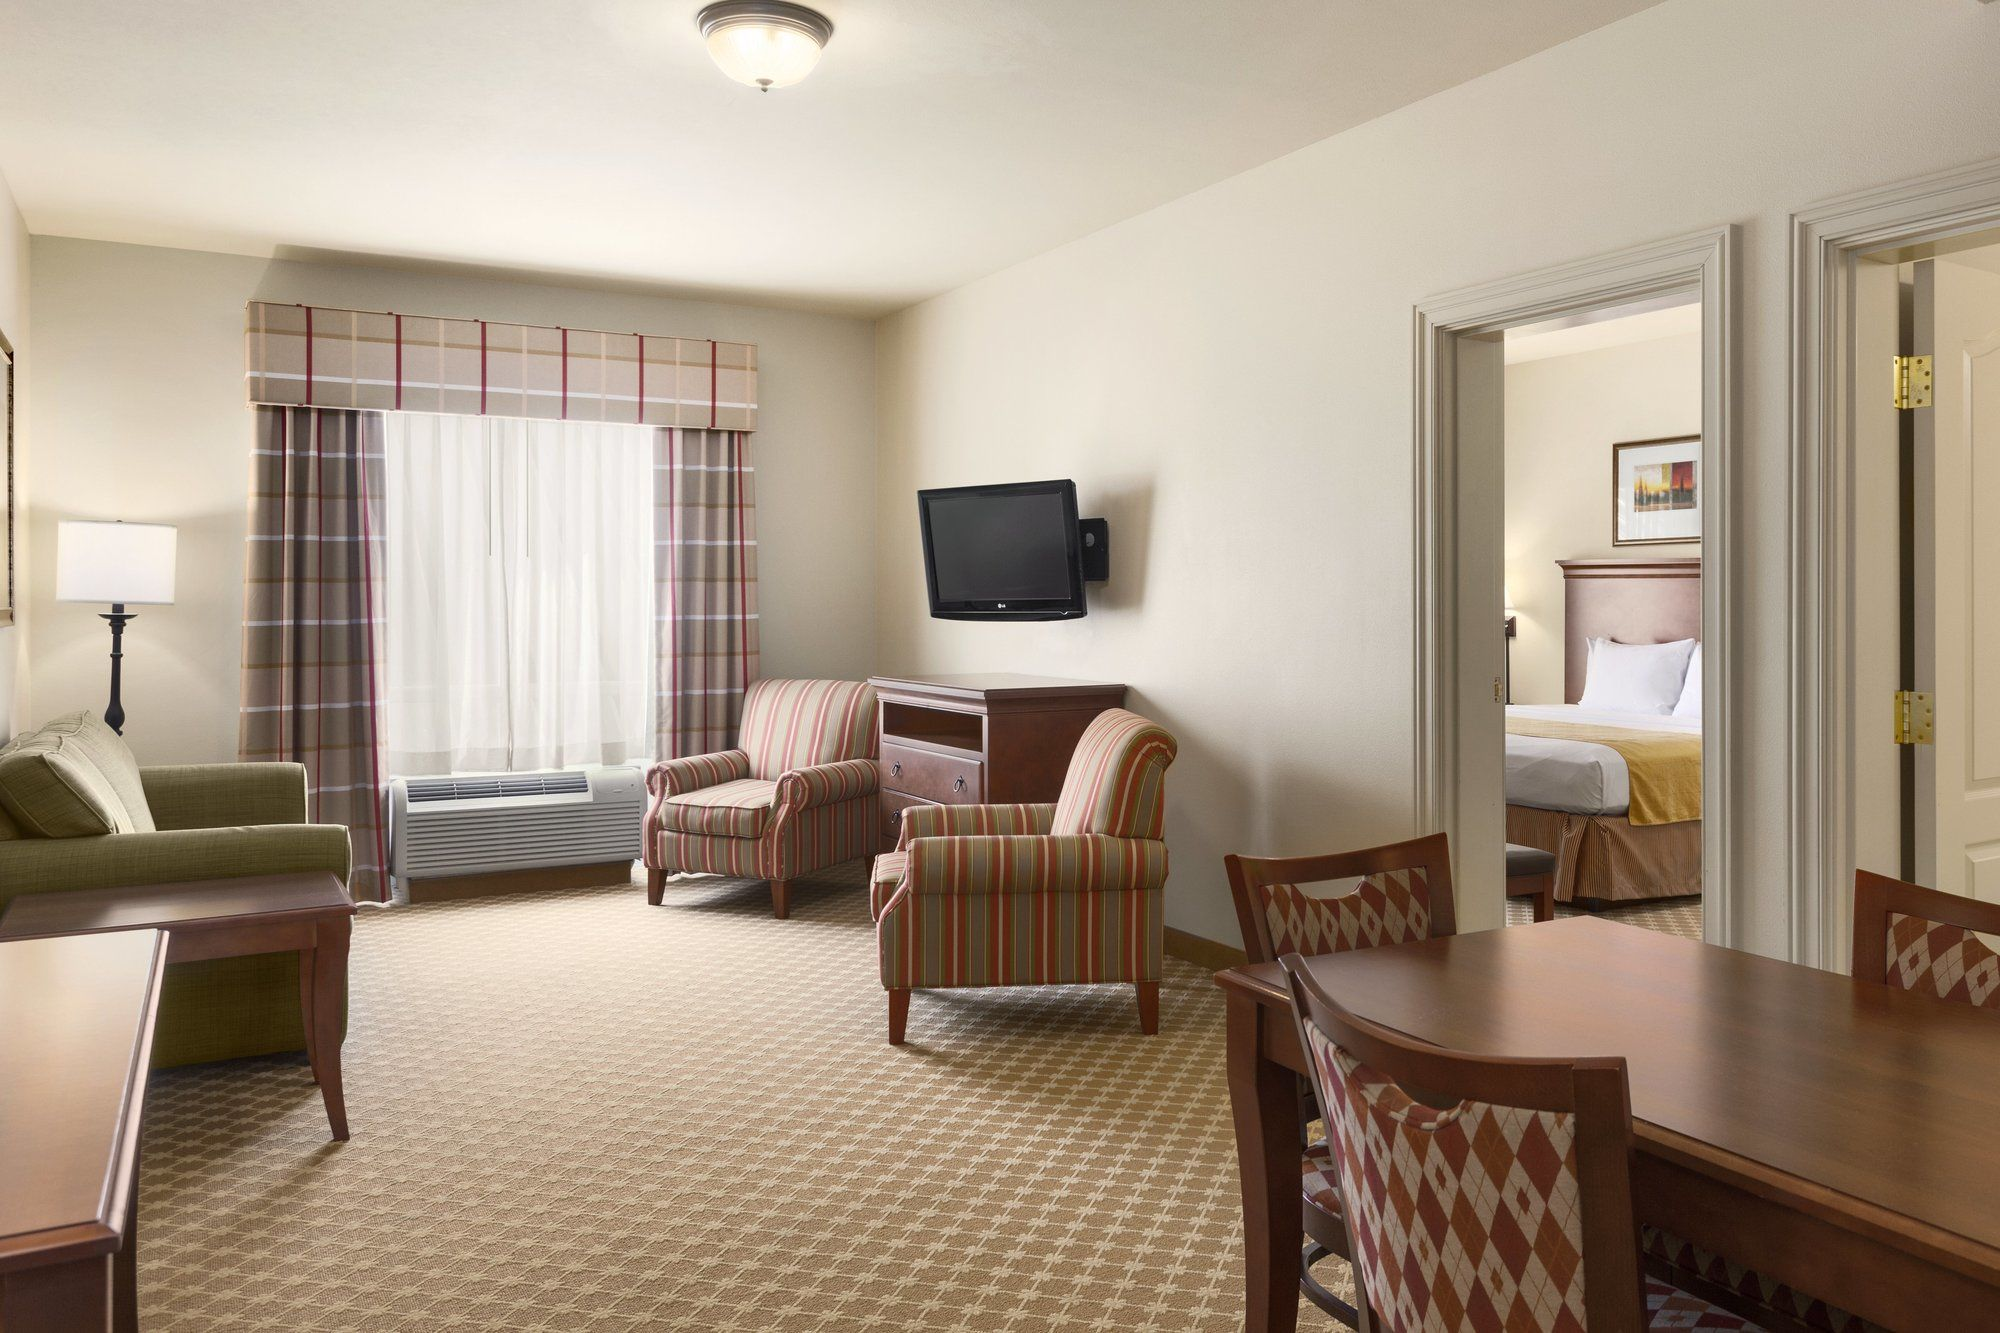 Country Inn & Suites in Tifton, GA